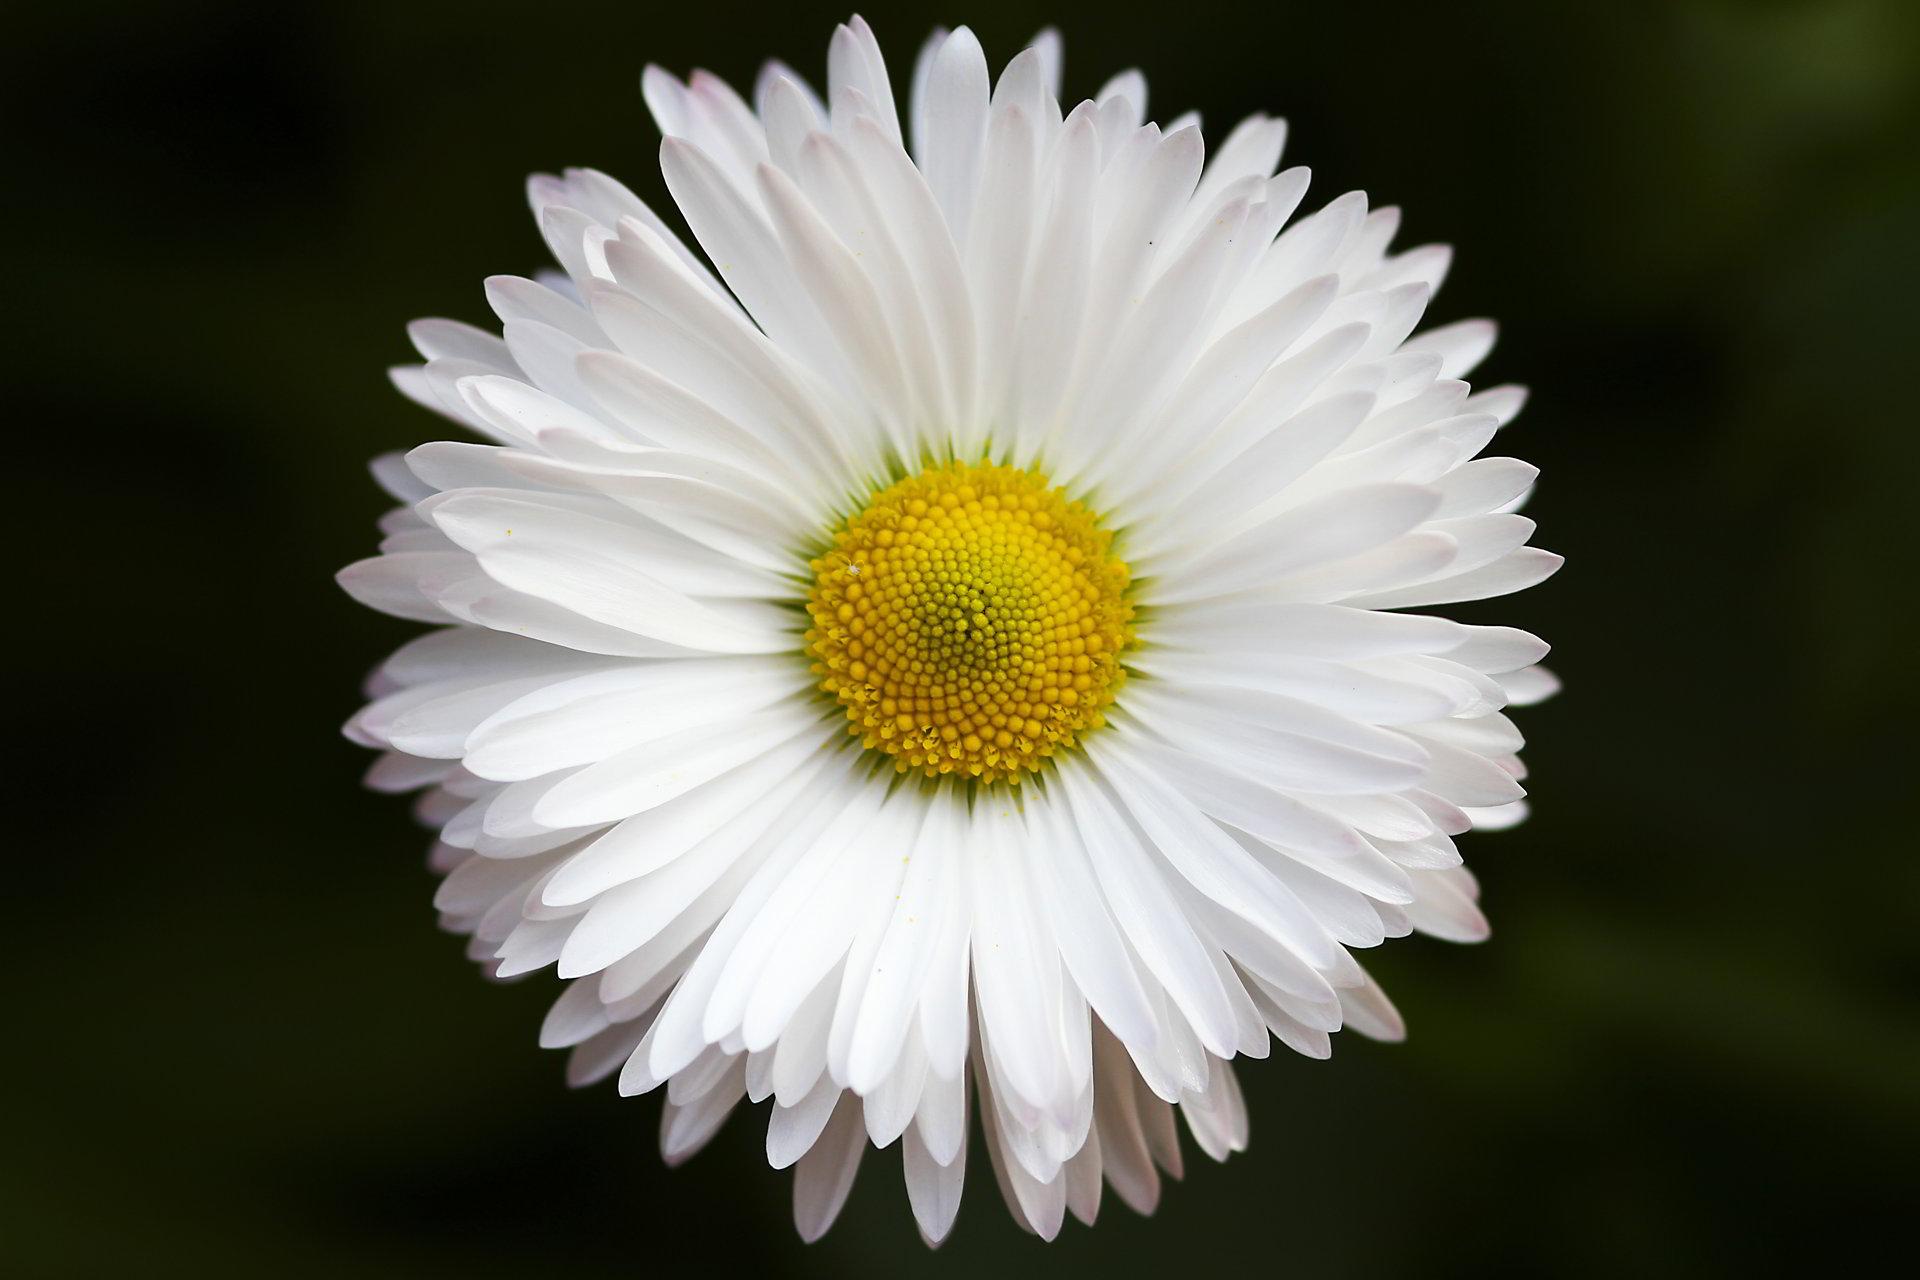 hinh anh hoa cuc dep 73